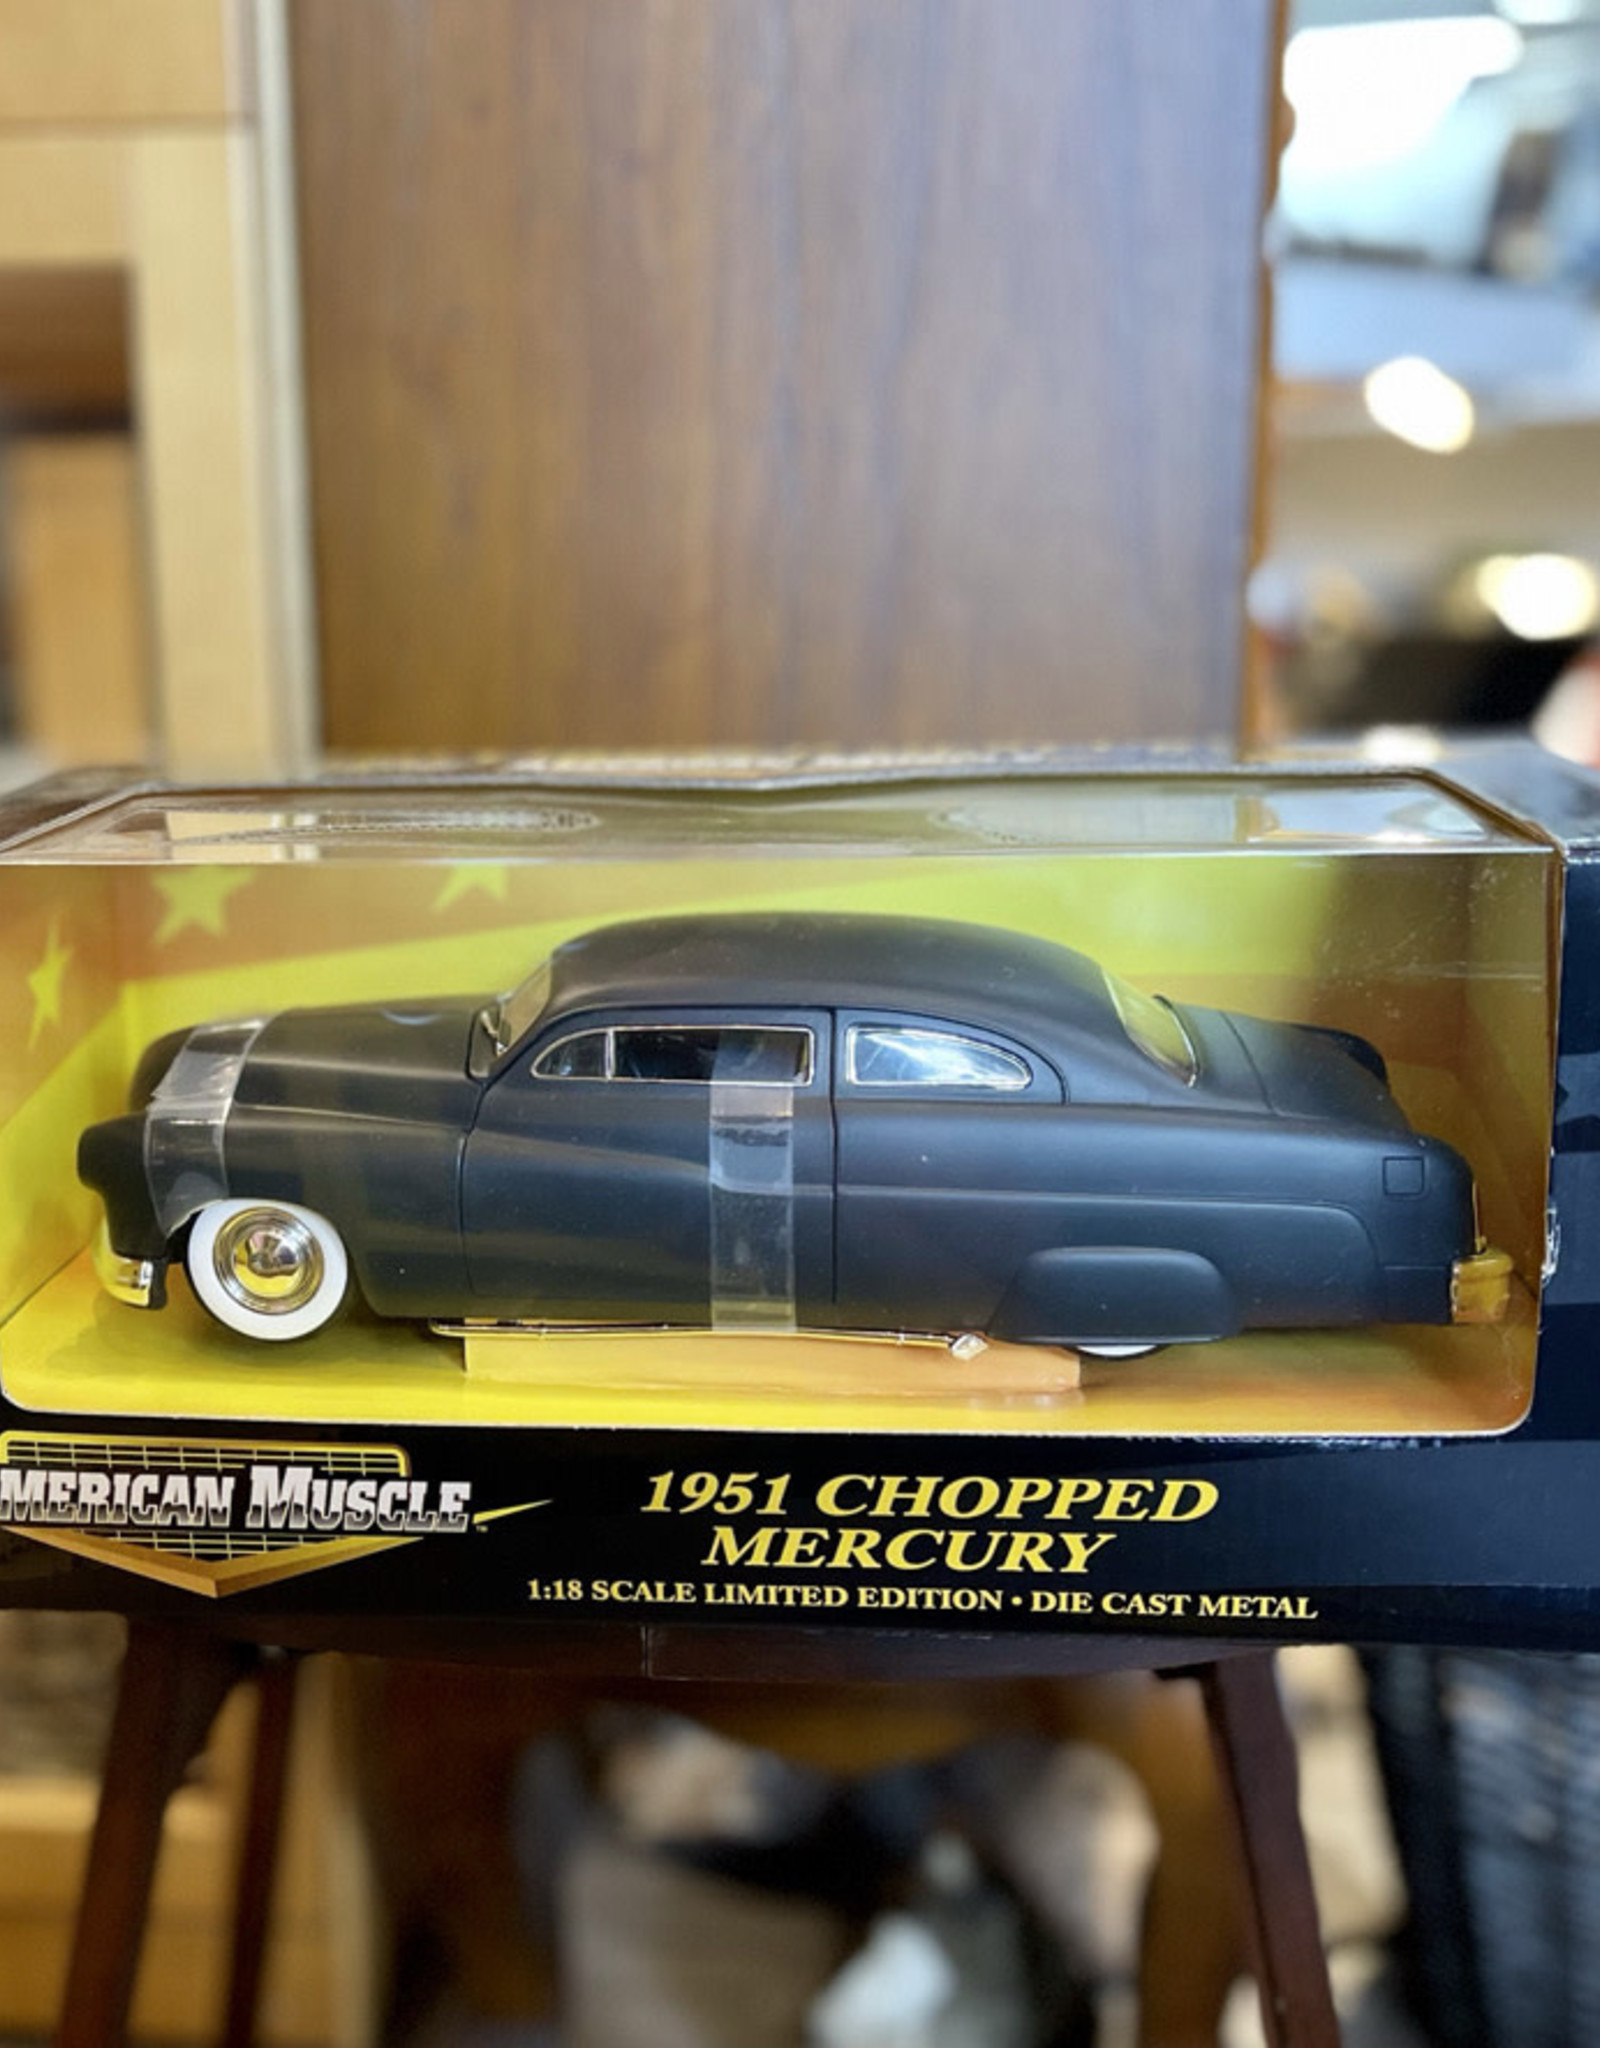 DieCast Car 1951 Chopped Mercury